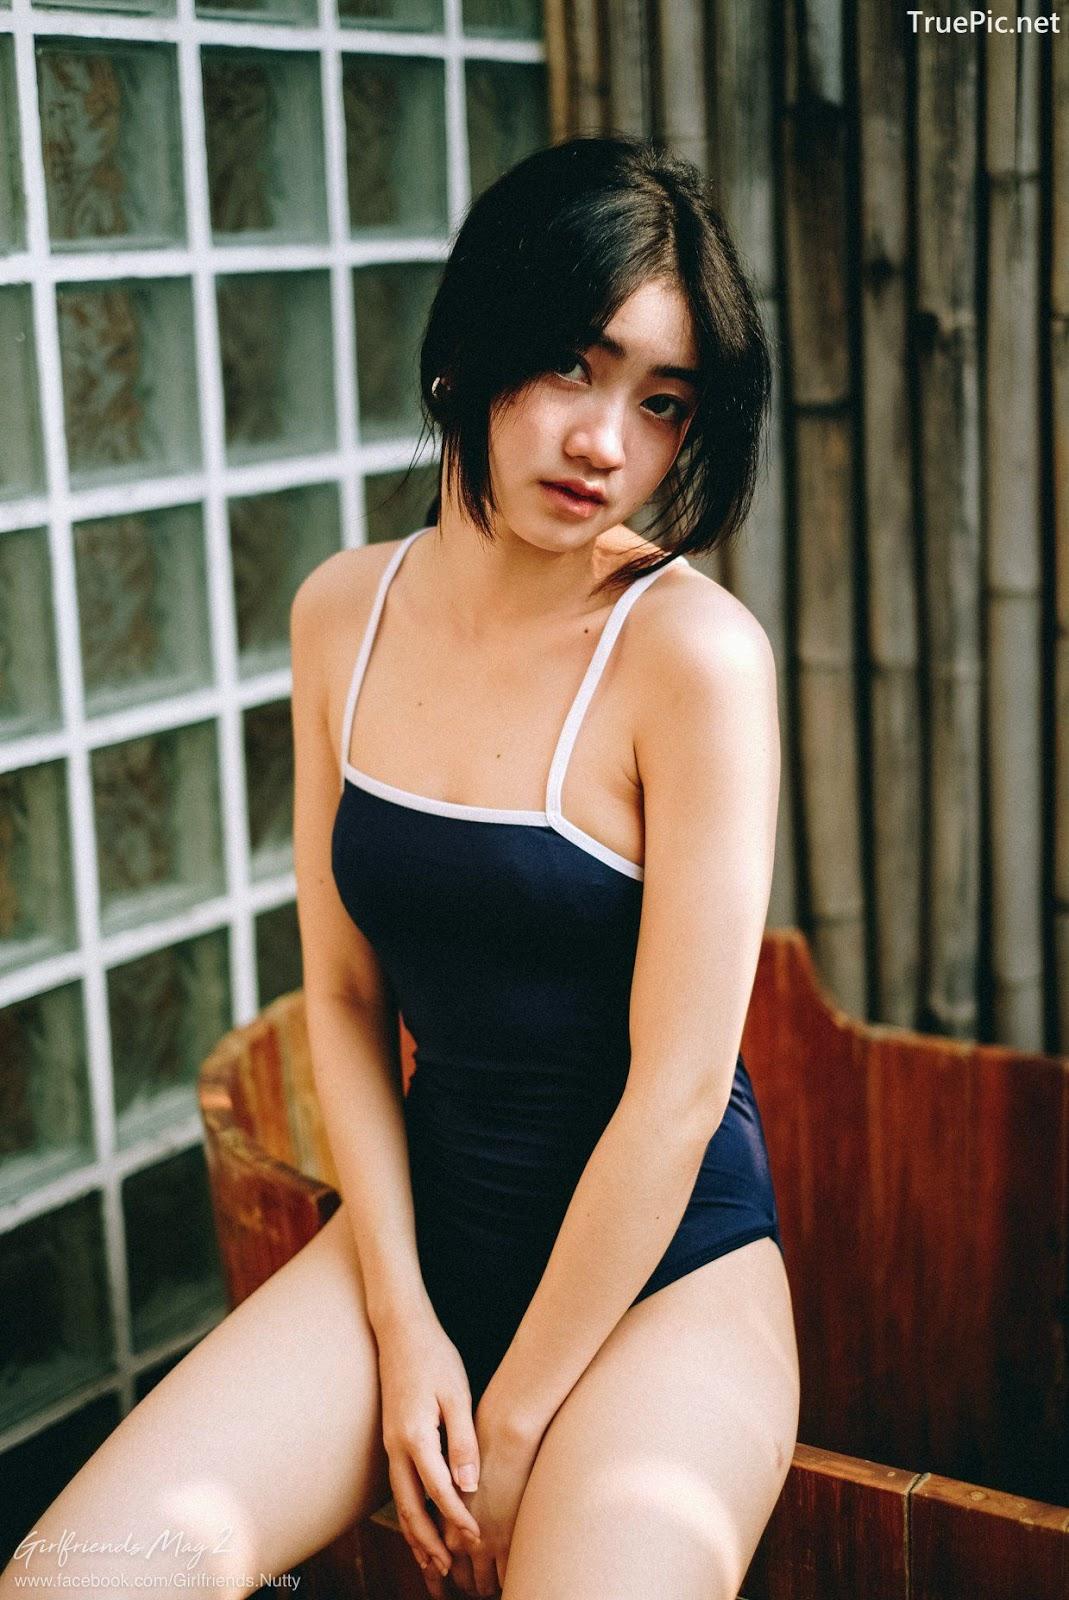 Image Thailand Model - Cholticha Intapuang - Sukumizu - TruePic.net - Picture-9